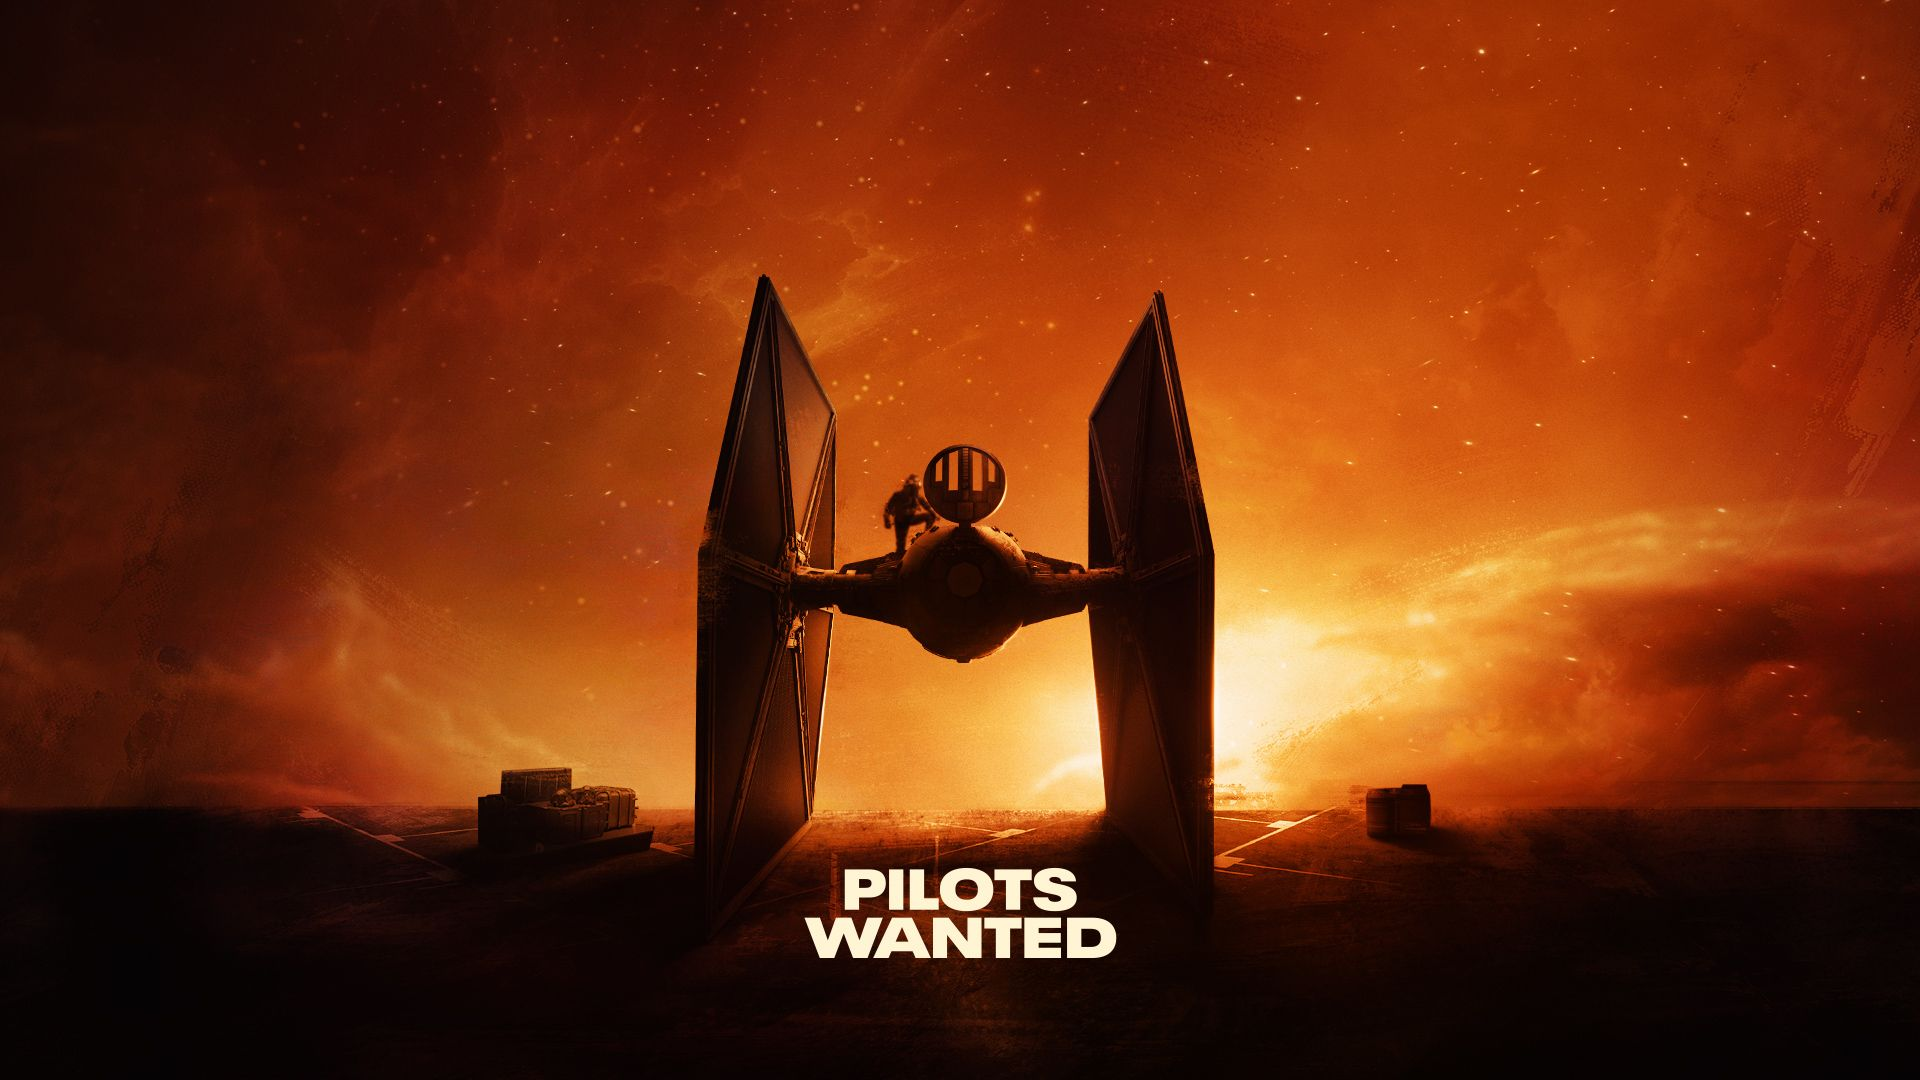 Star Wars Squadrons Teaser In 2020 Star Wars Art Star Wars Video Games Star Wars